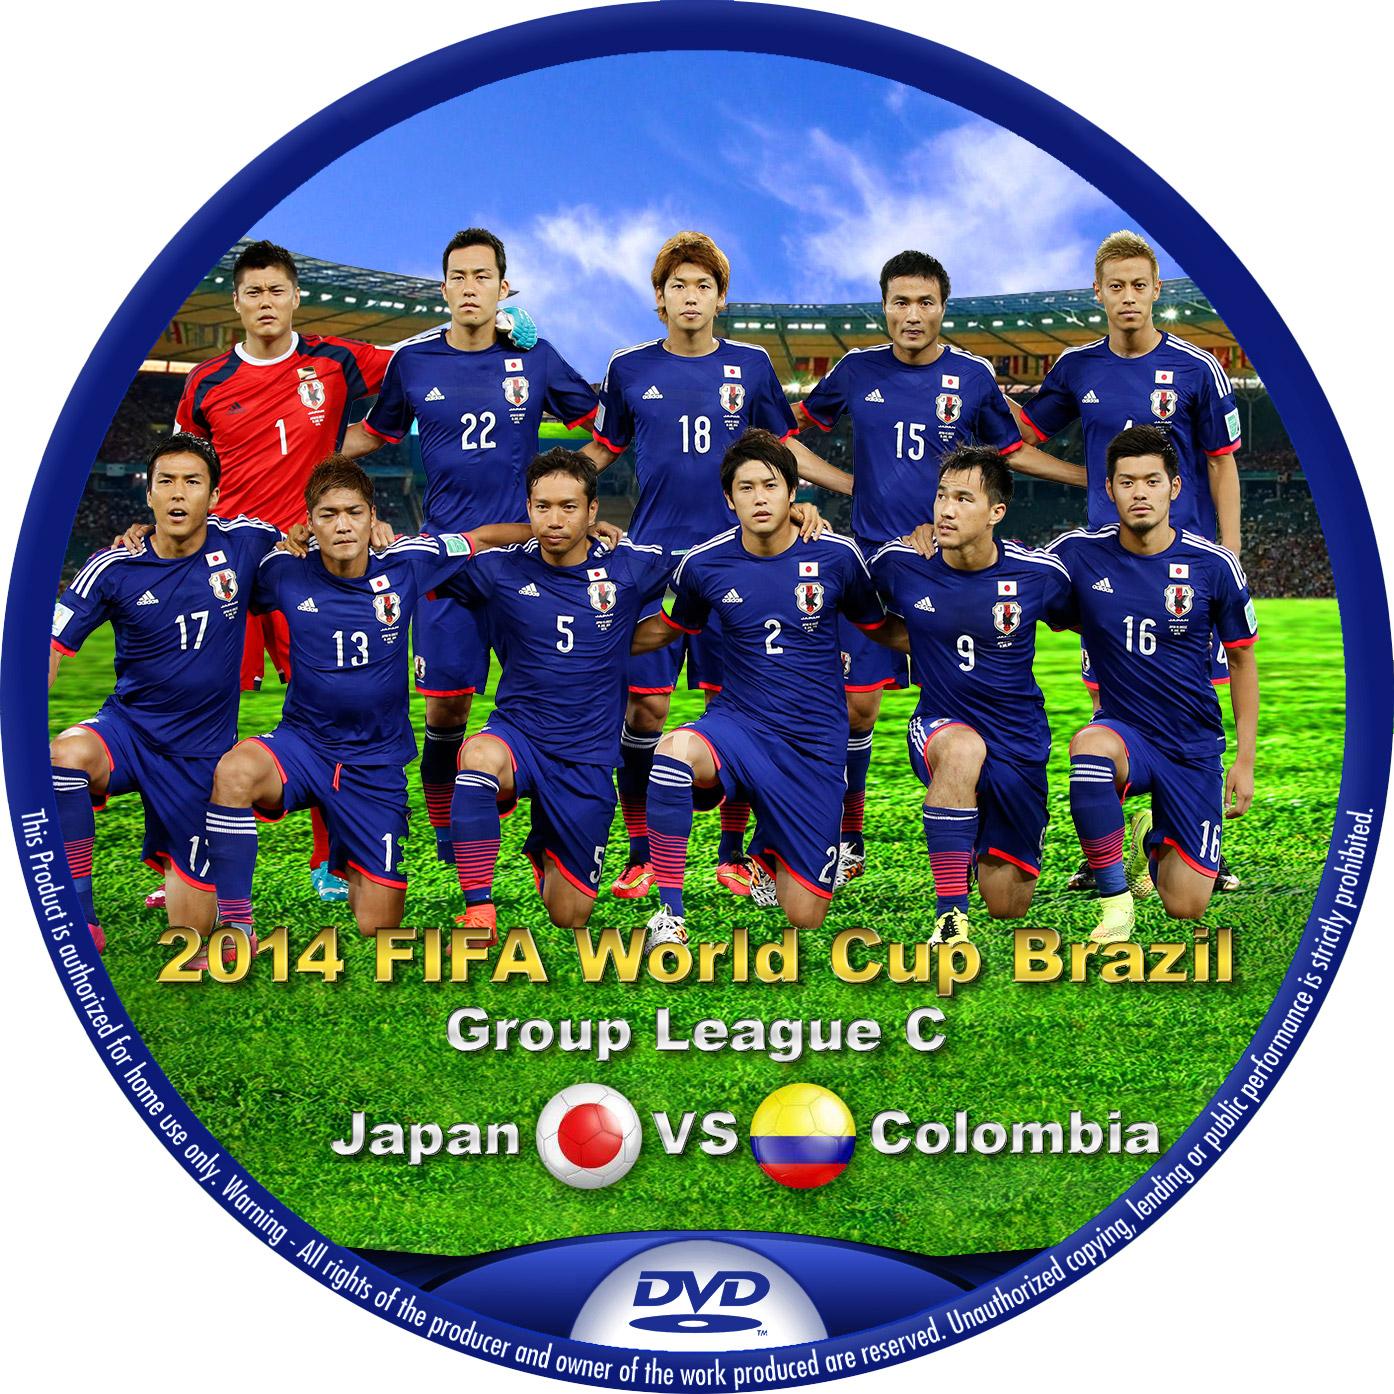 W杯 2014 ブラジル 日本代表 コロンビア DVDラベル